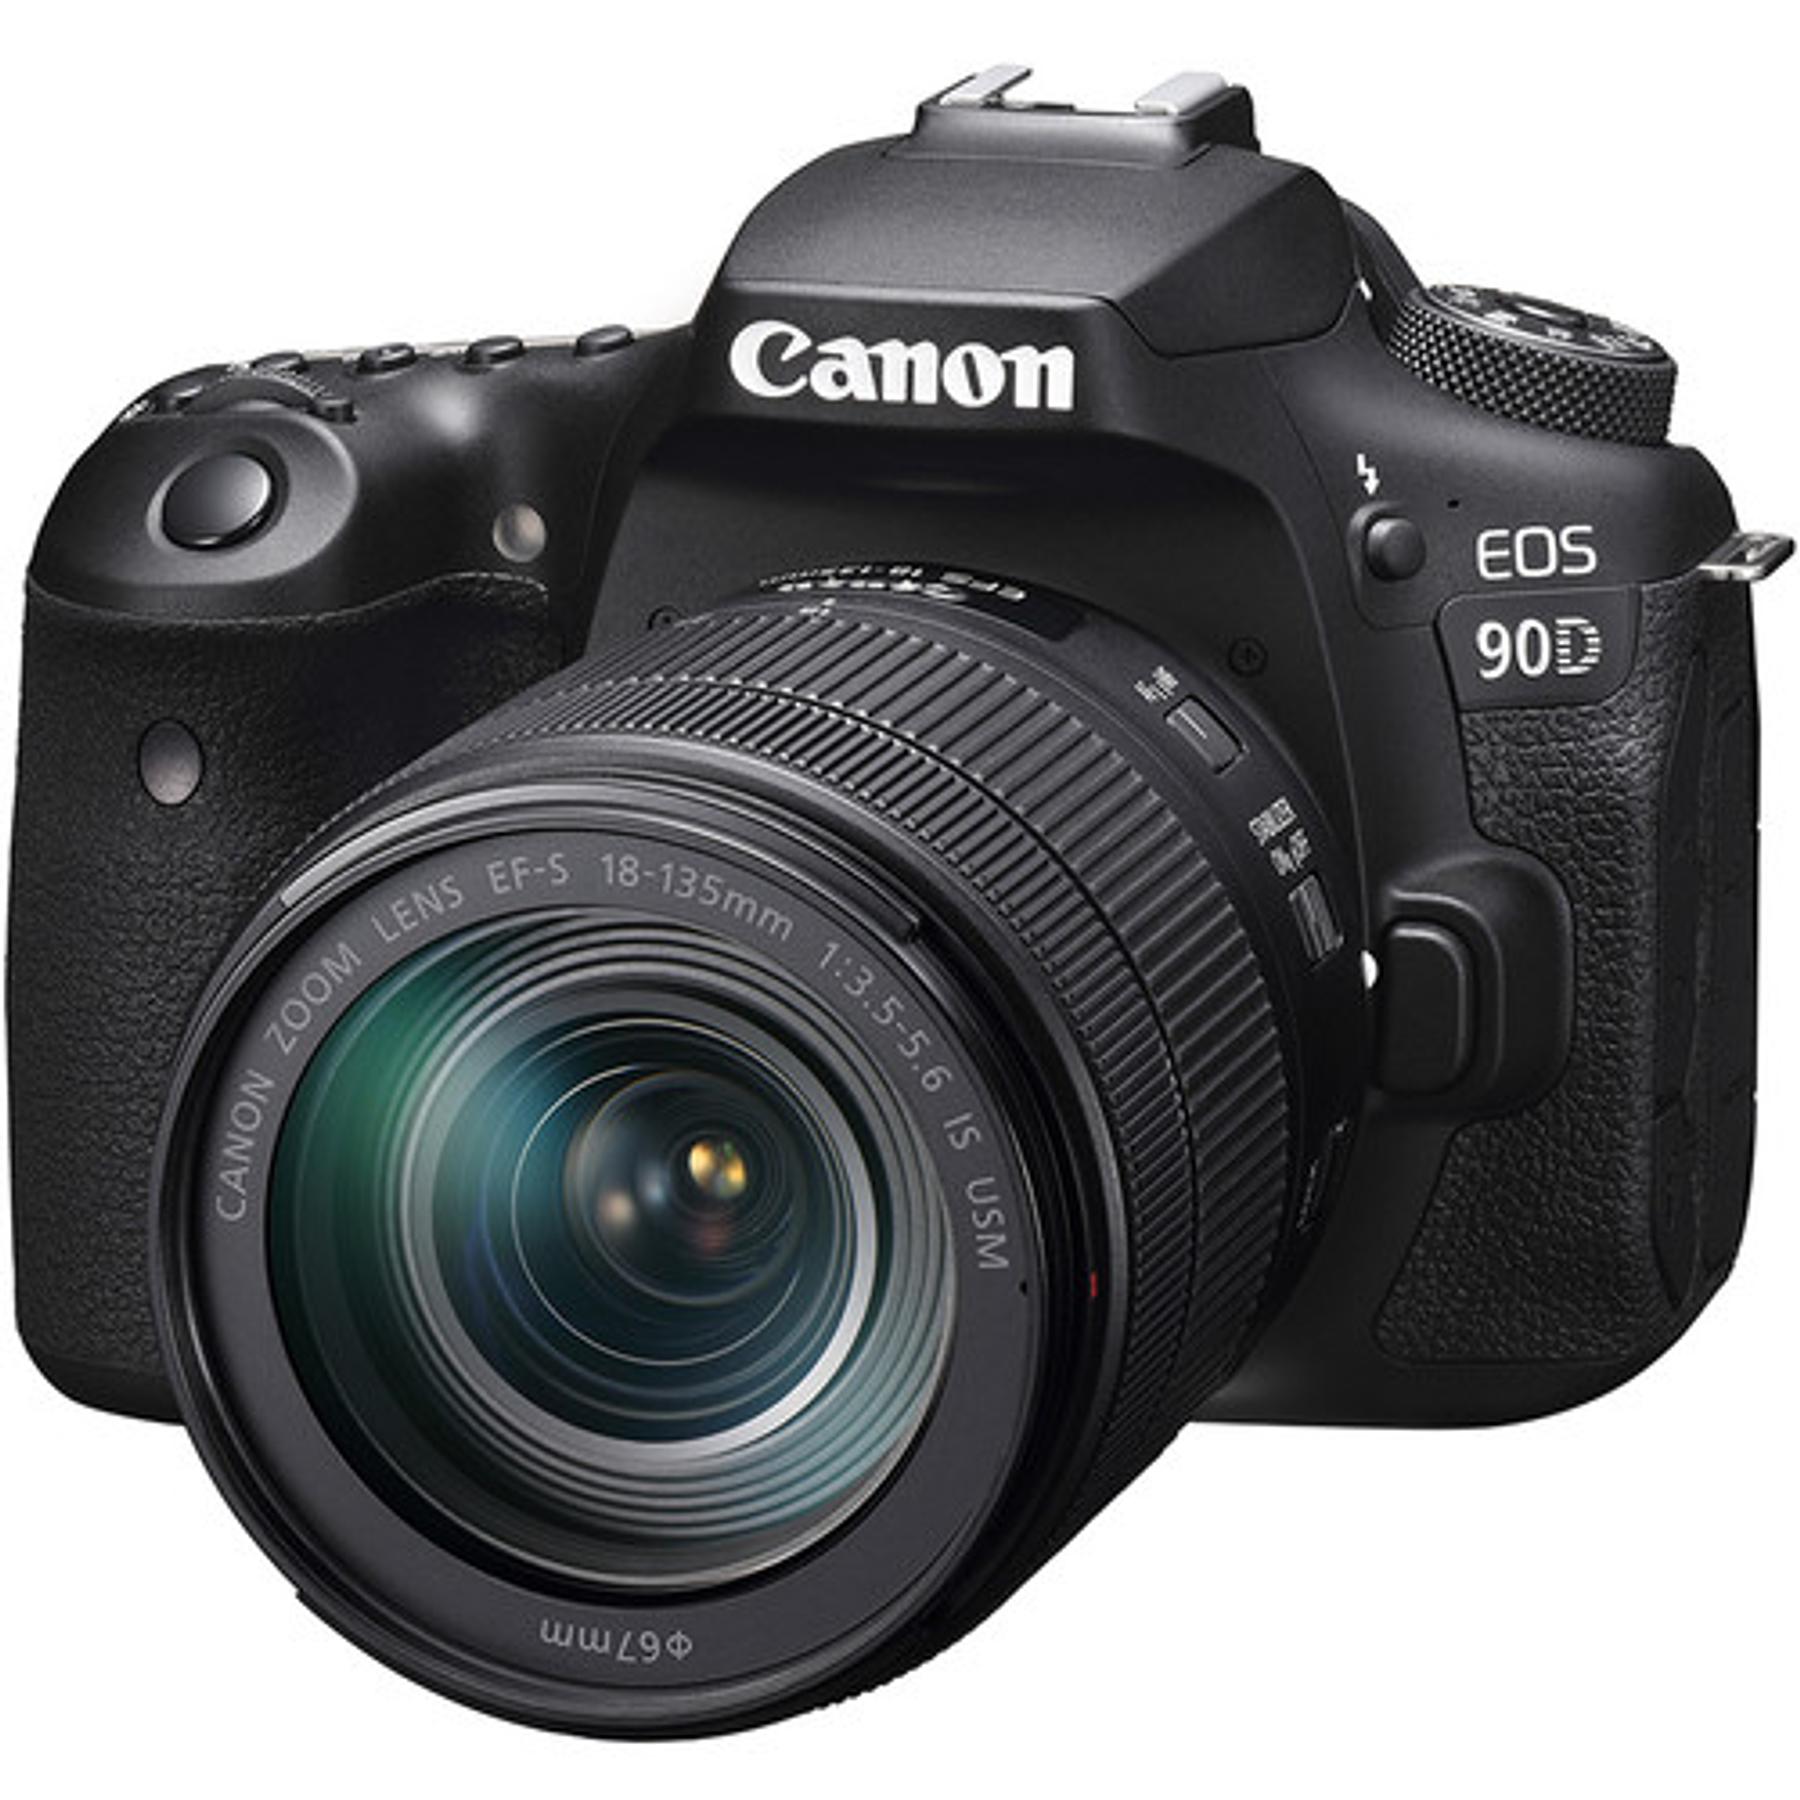 Camara EOS 90D C/18-135IS IS USM. Código 3616C016